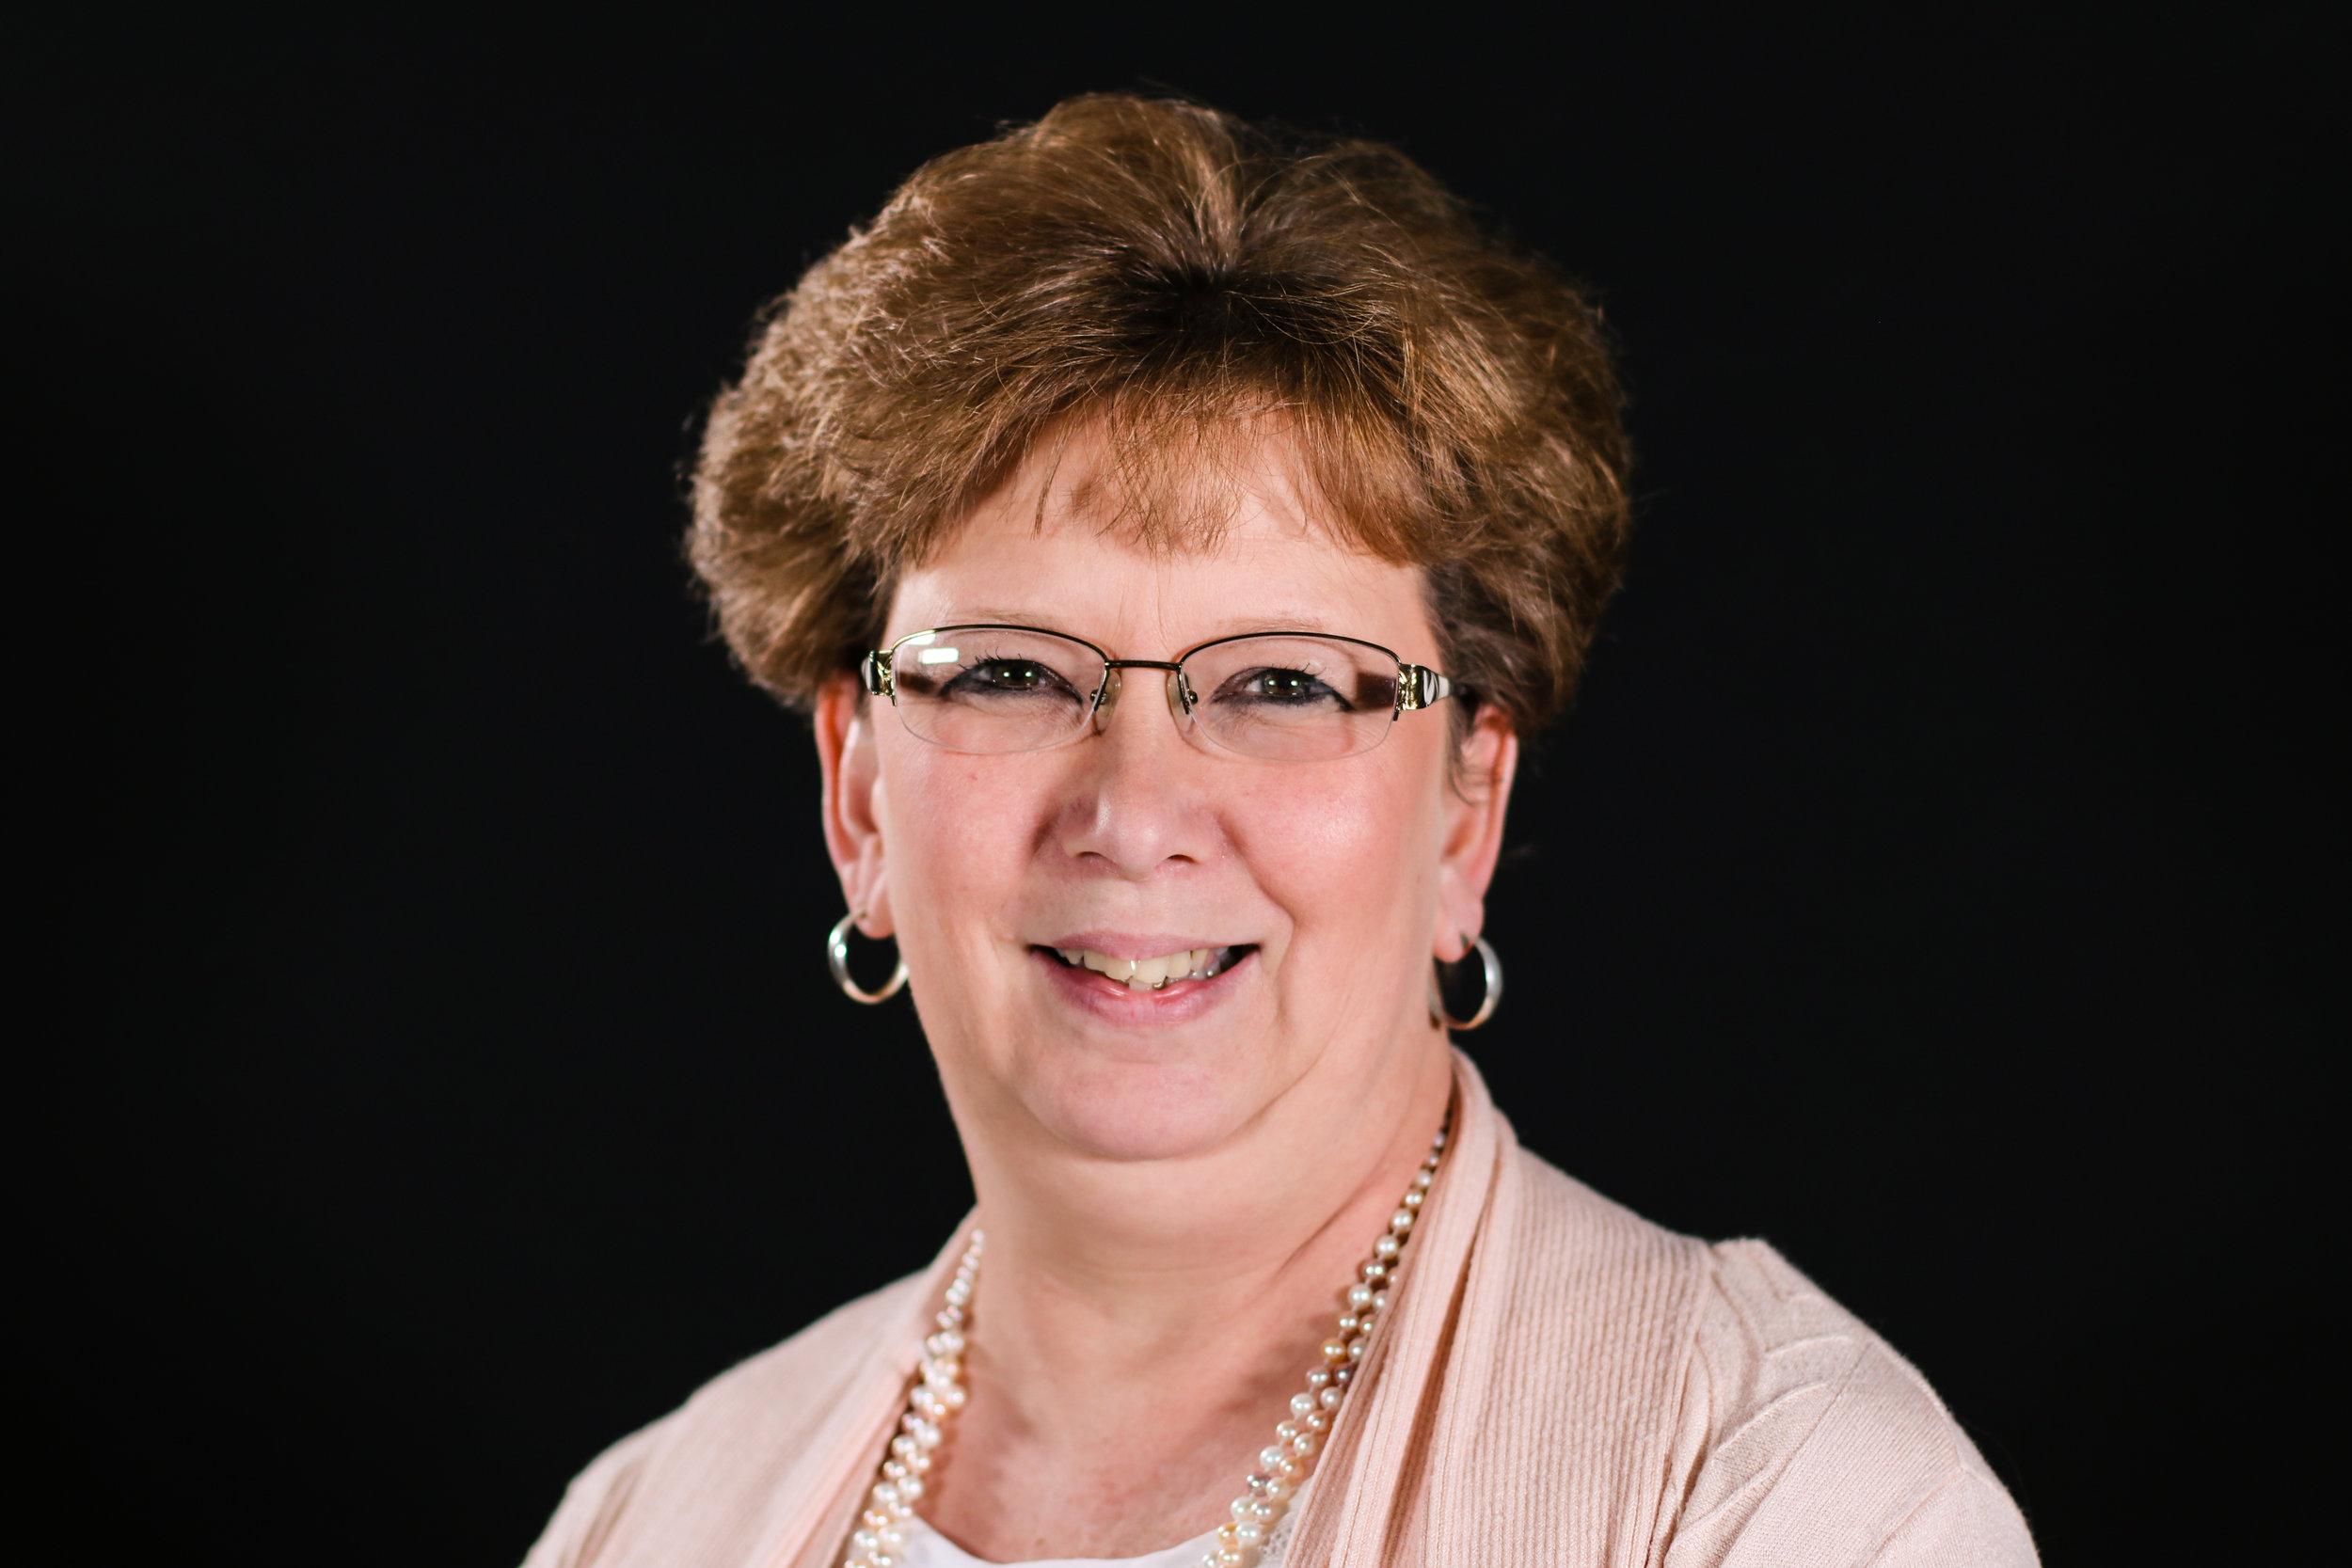 Rhonda Cotham, Director of Student Success